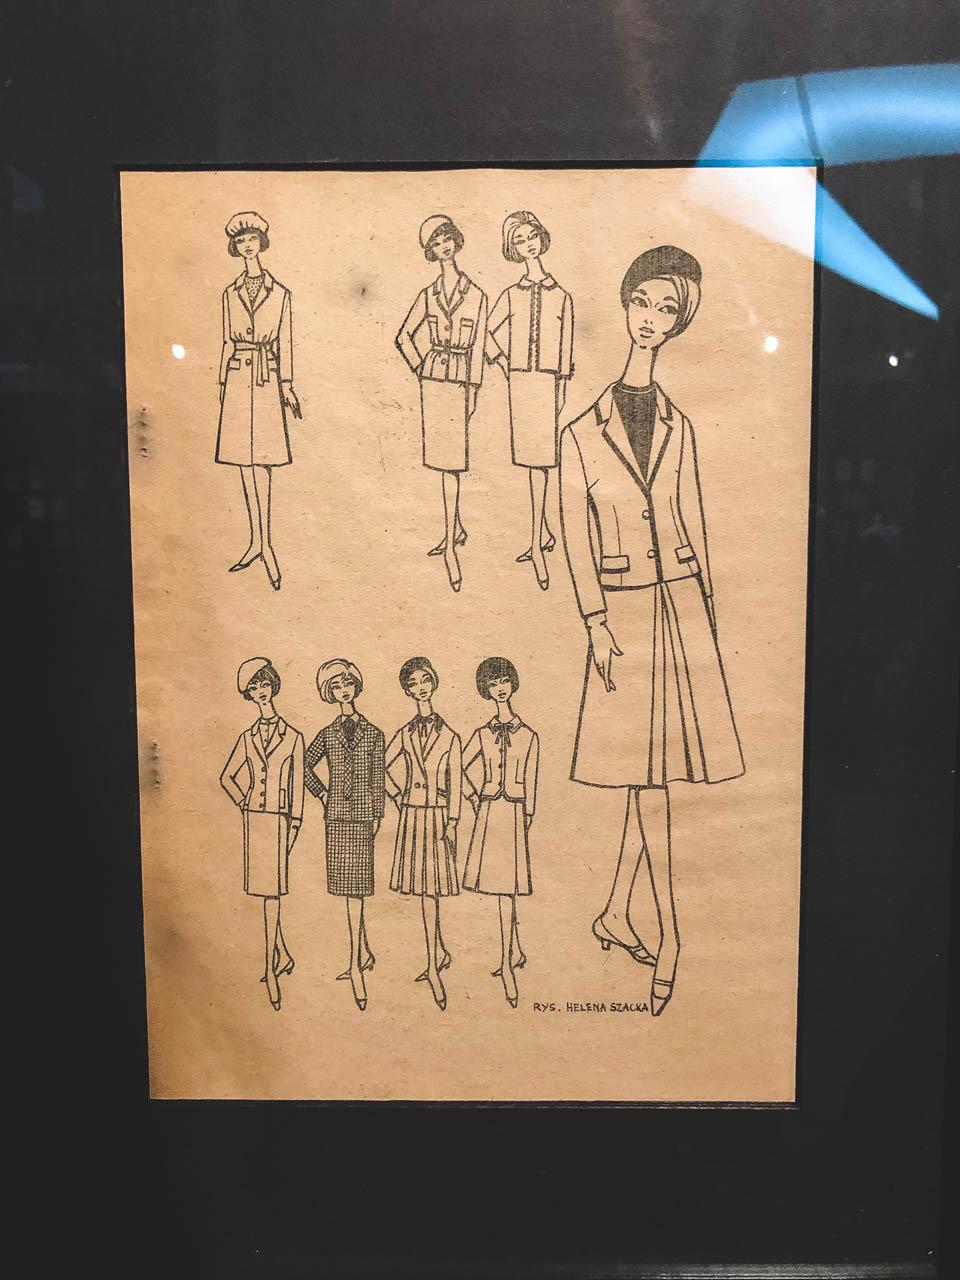 Fashion sketches of Moda Polska at The Central Museum of Textiles in Łódź, Poland